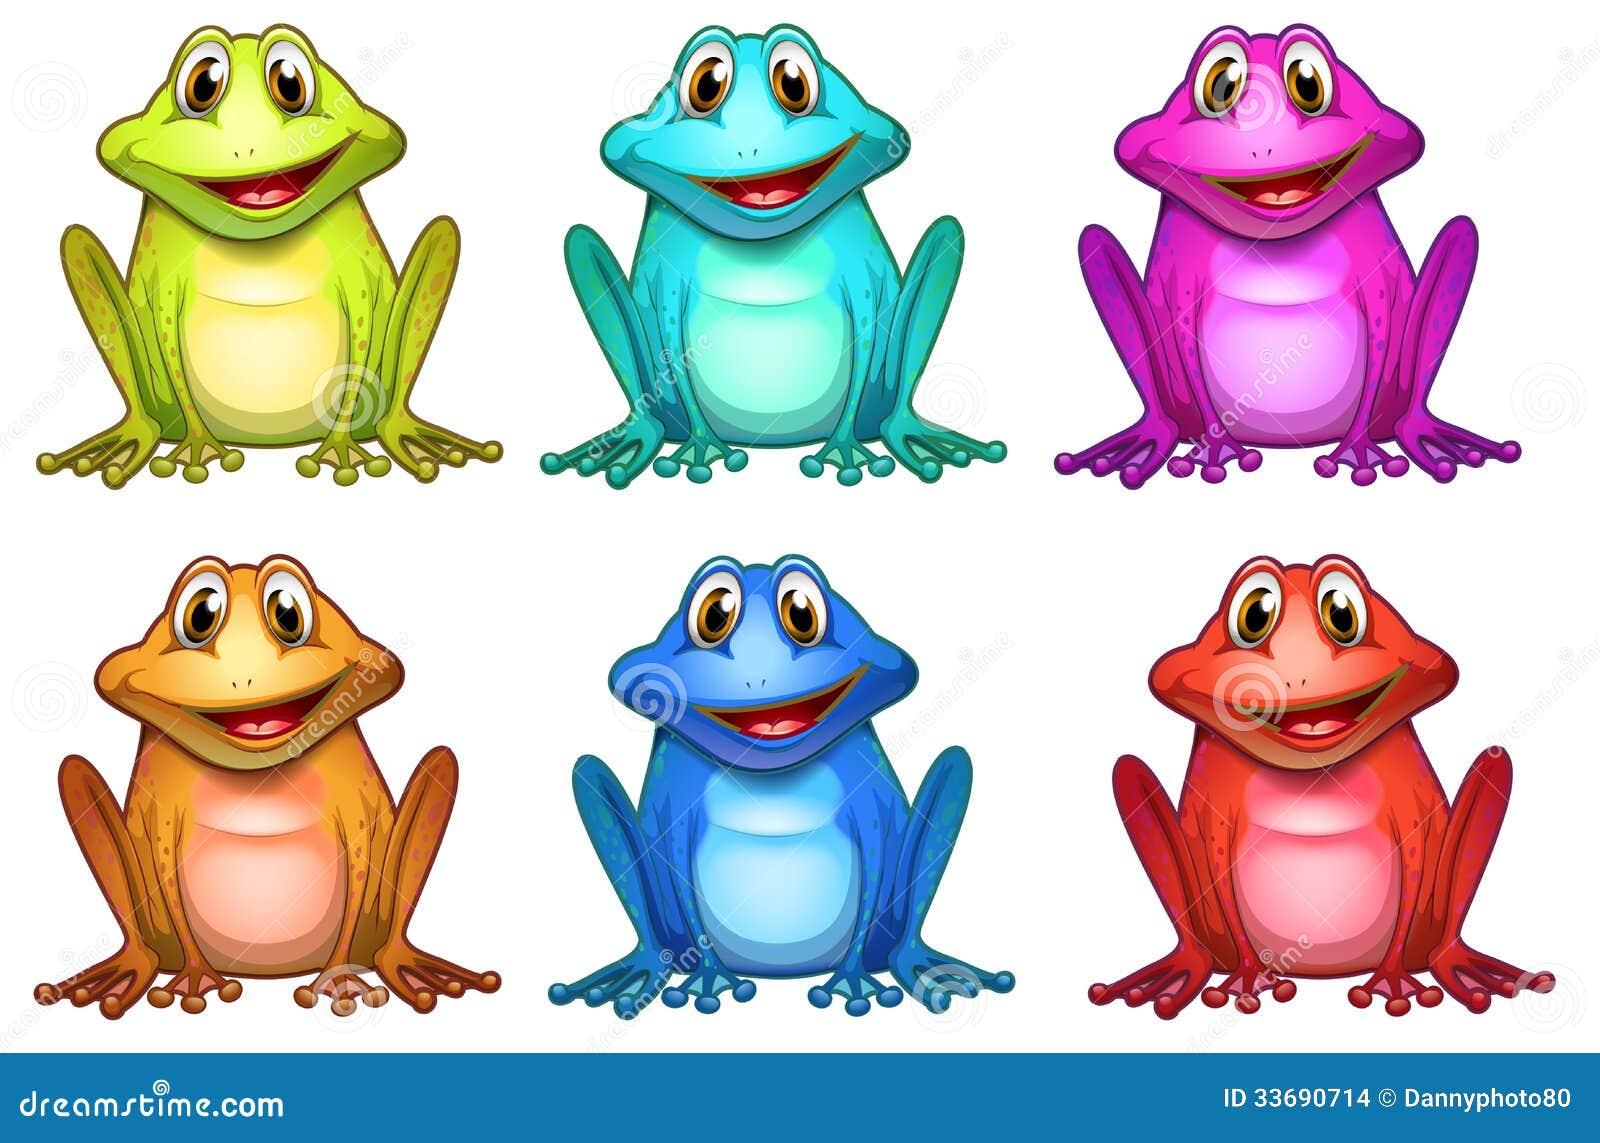 six different colors of frogs stock illustration image rain clip art cute rain clip art free